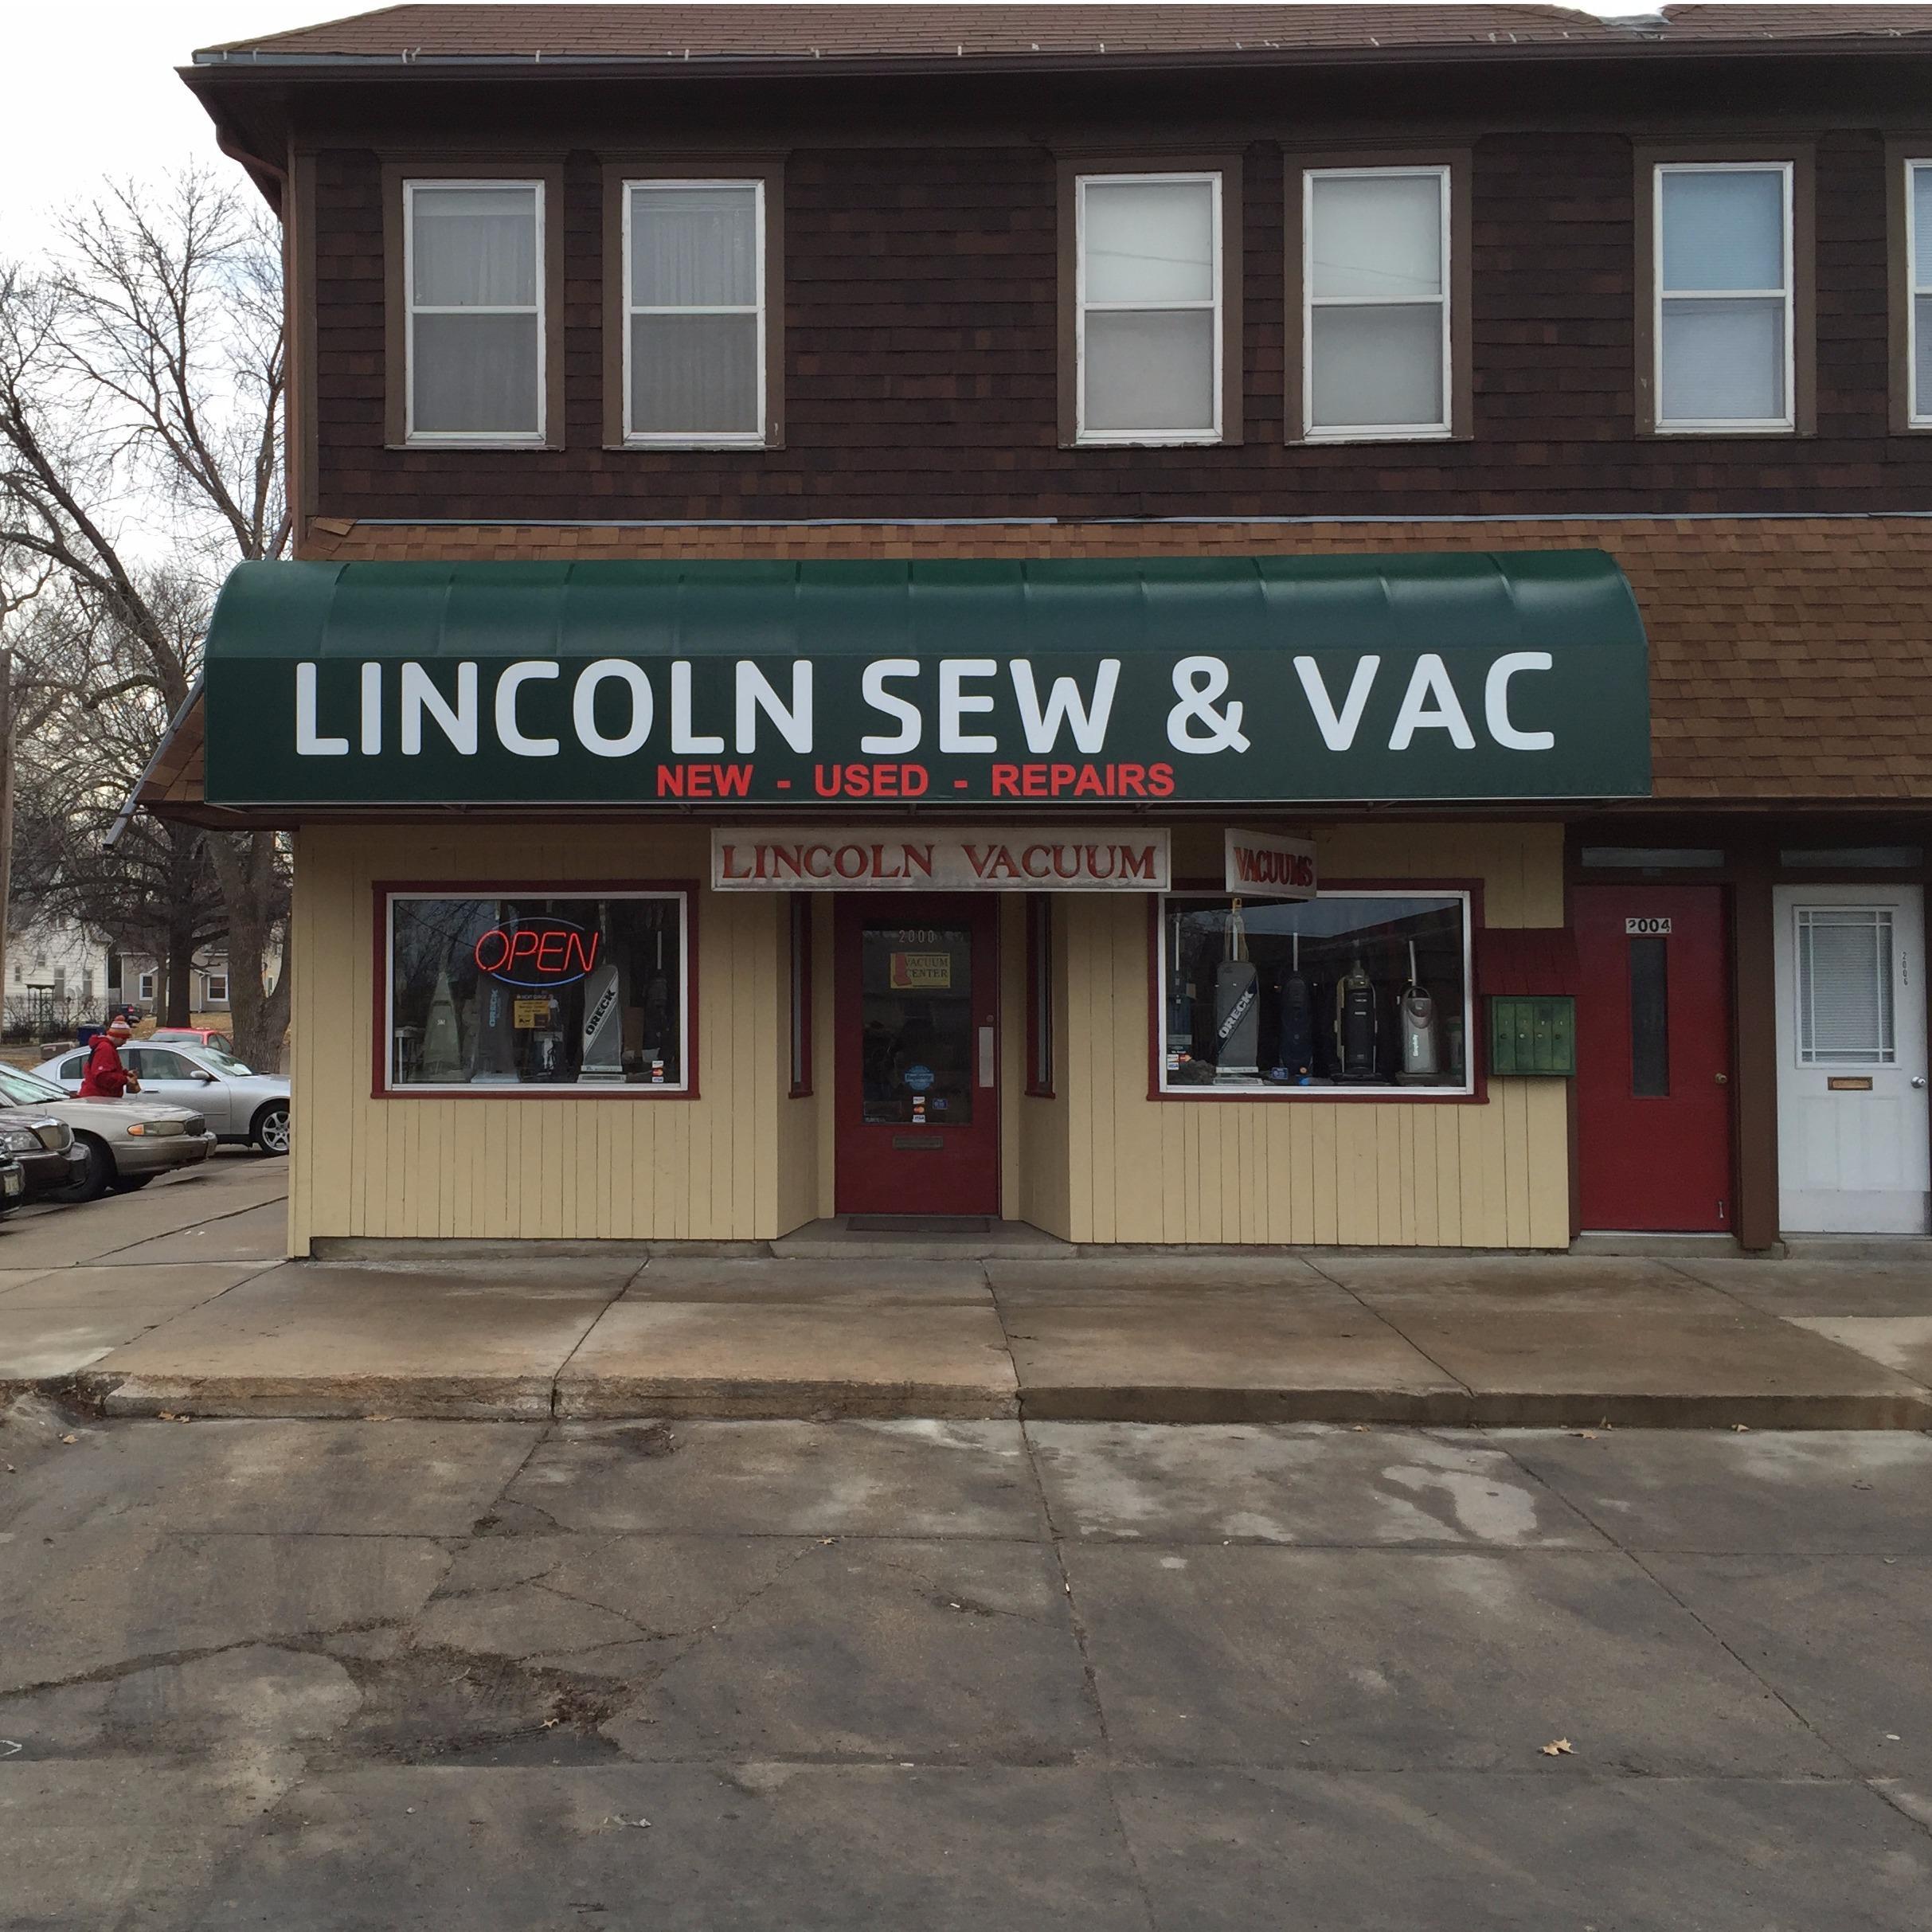 Lincoln Sew Vac™ Sew Vac Depot - Lincoln Vacuum